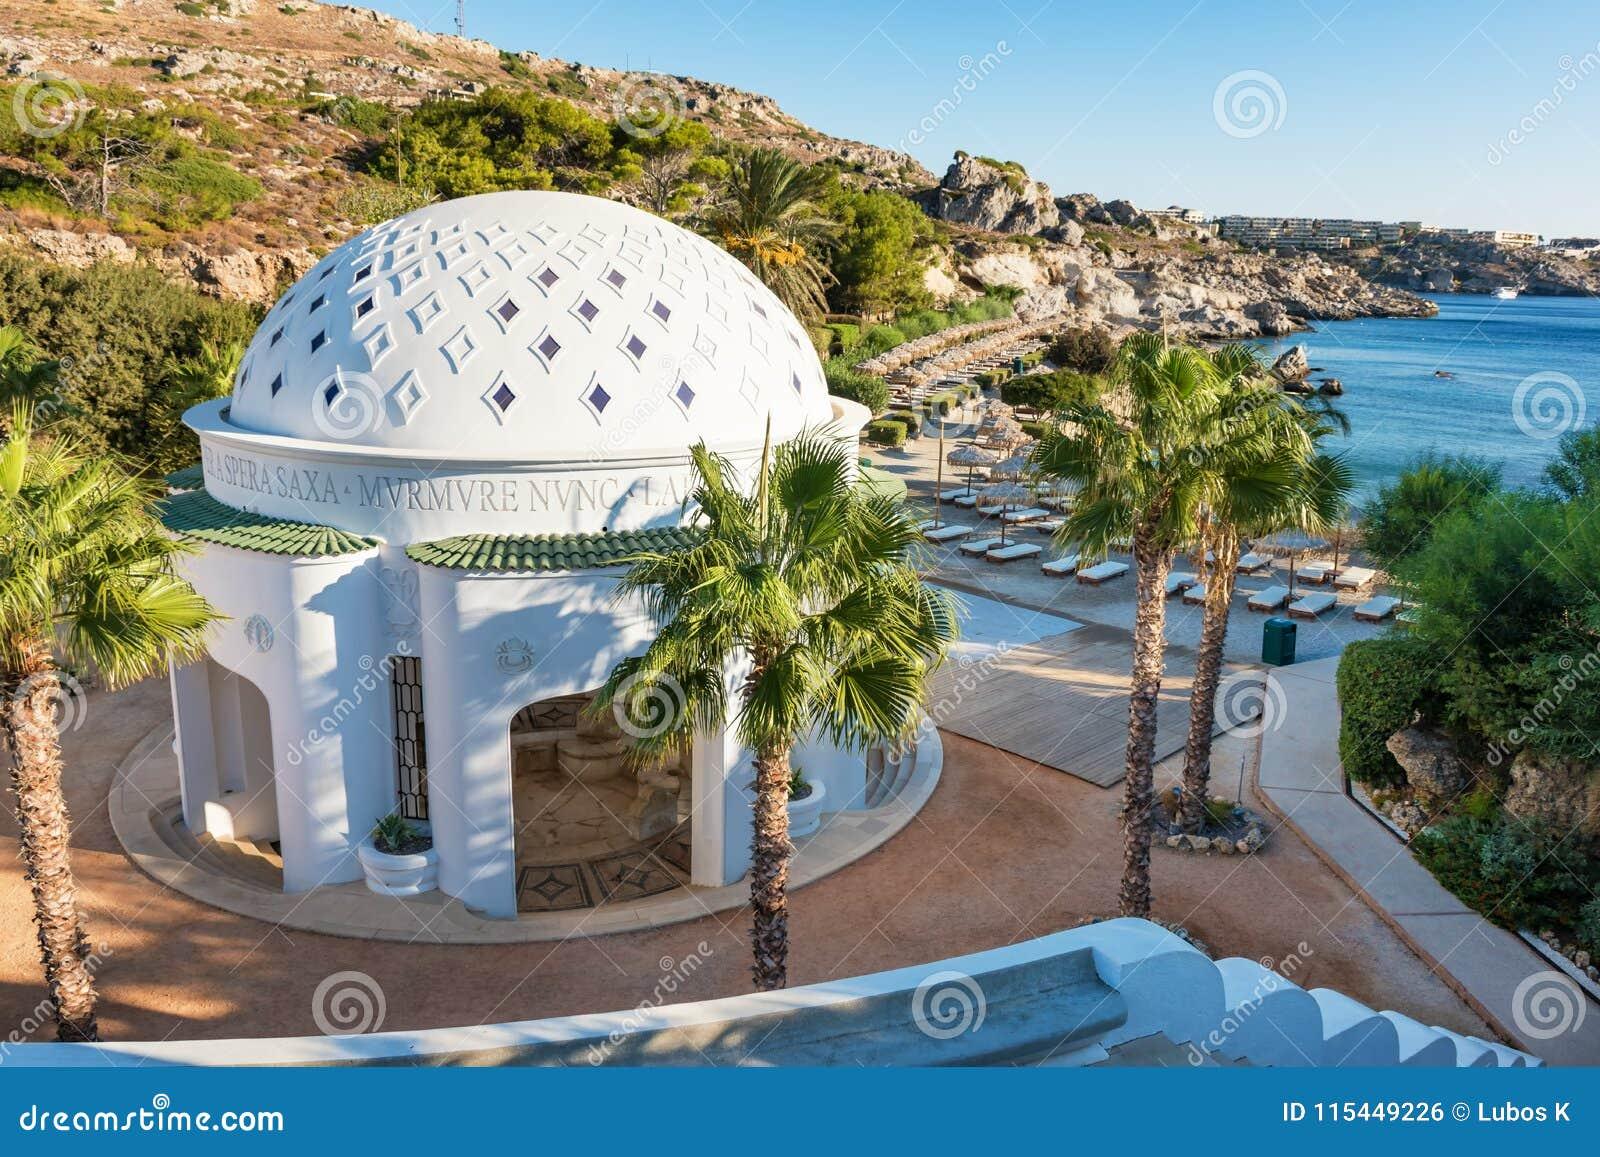 Bóveda en Kalithea Rodas, Grecia - traducción del texto: